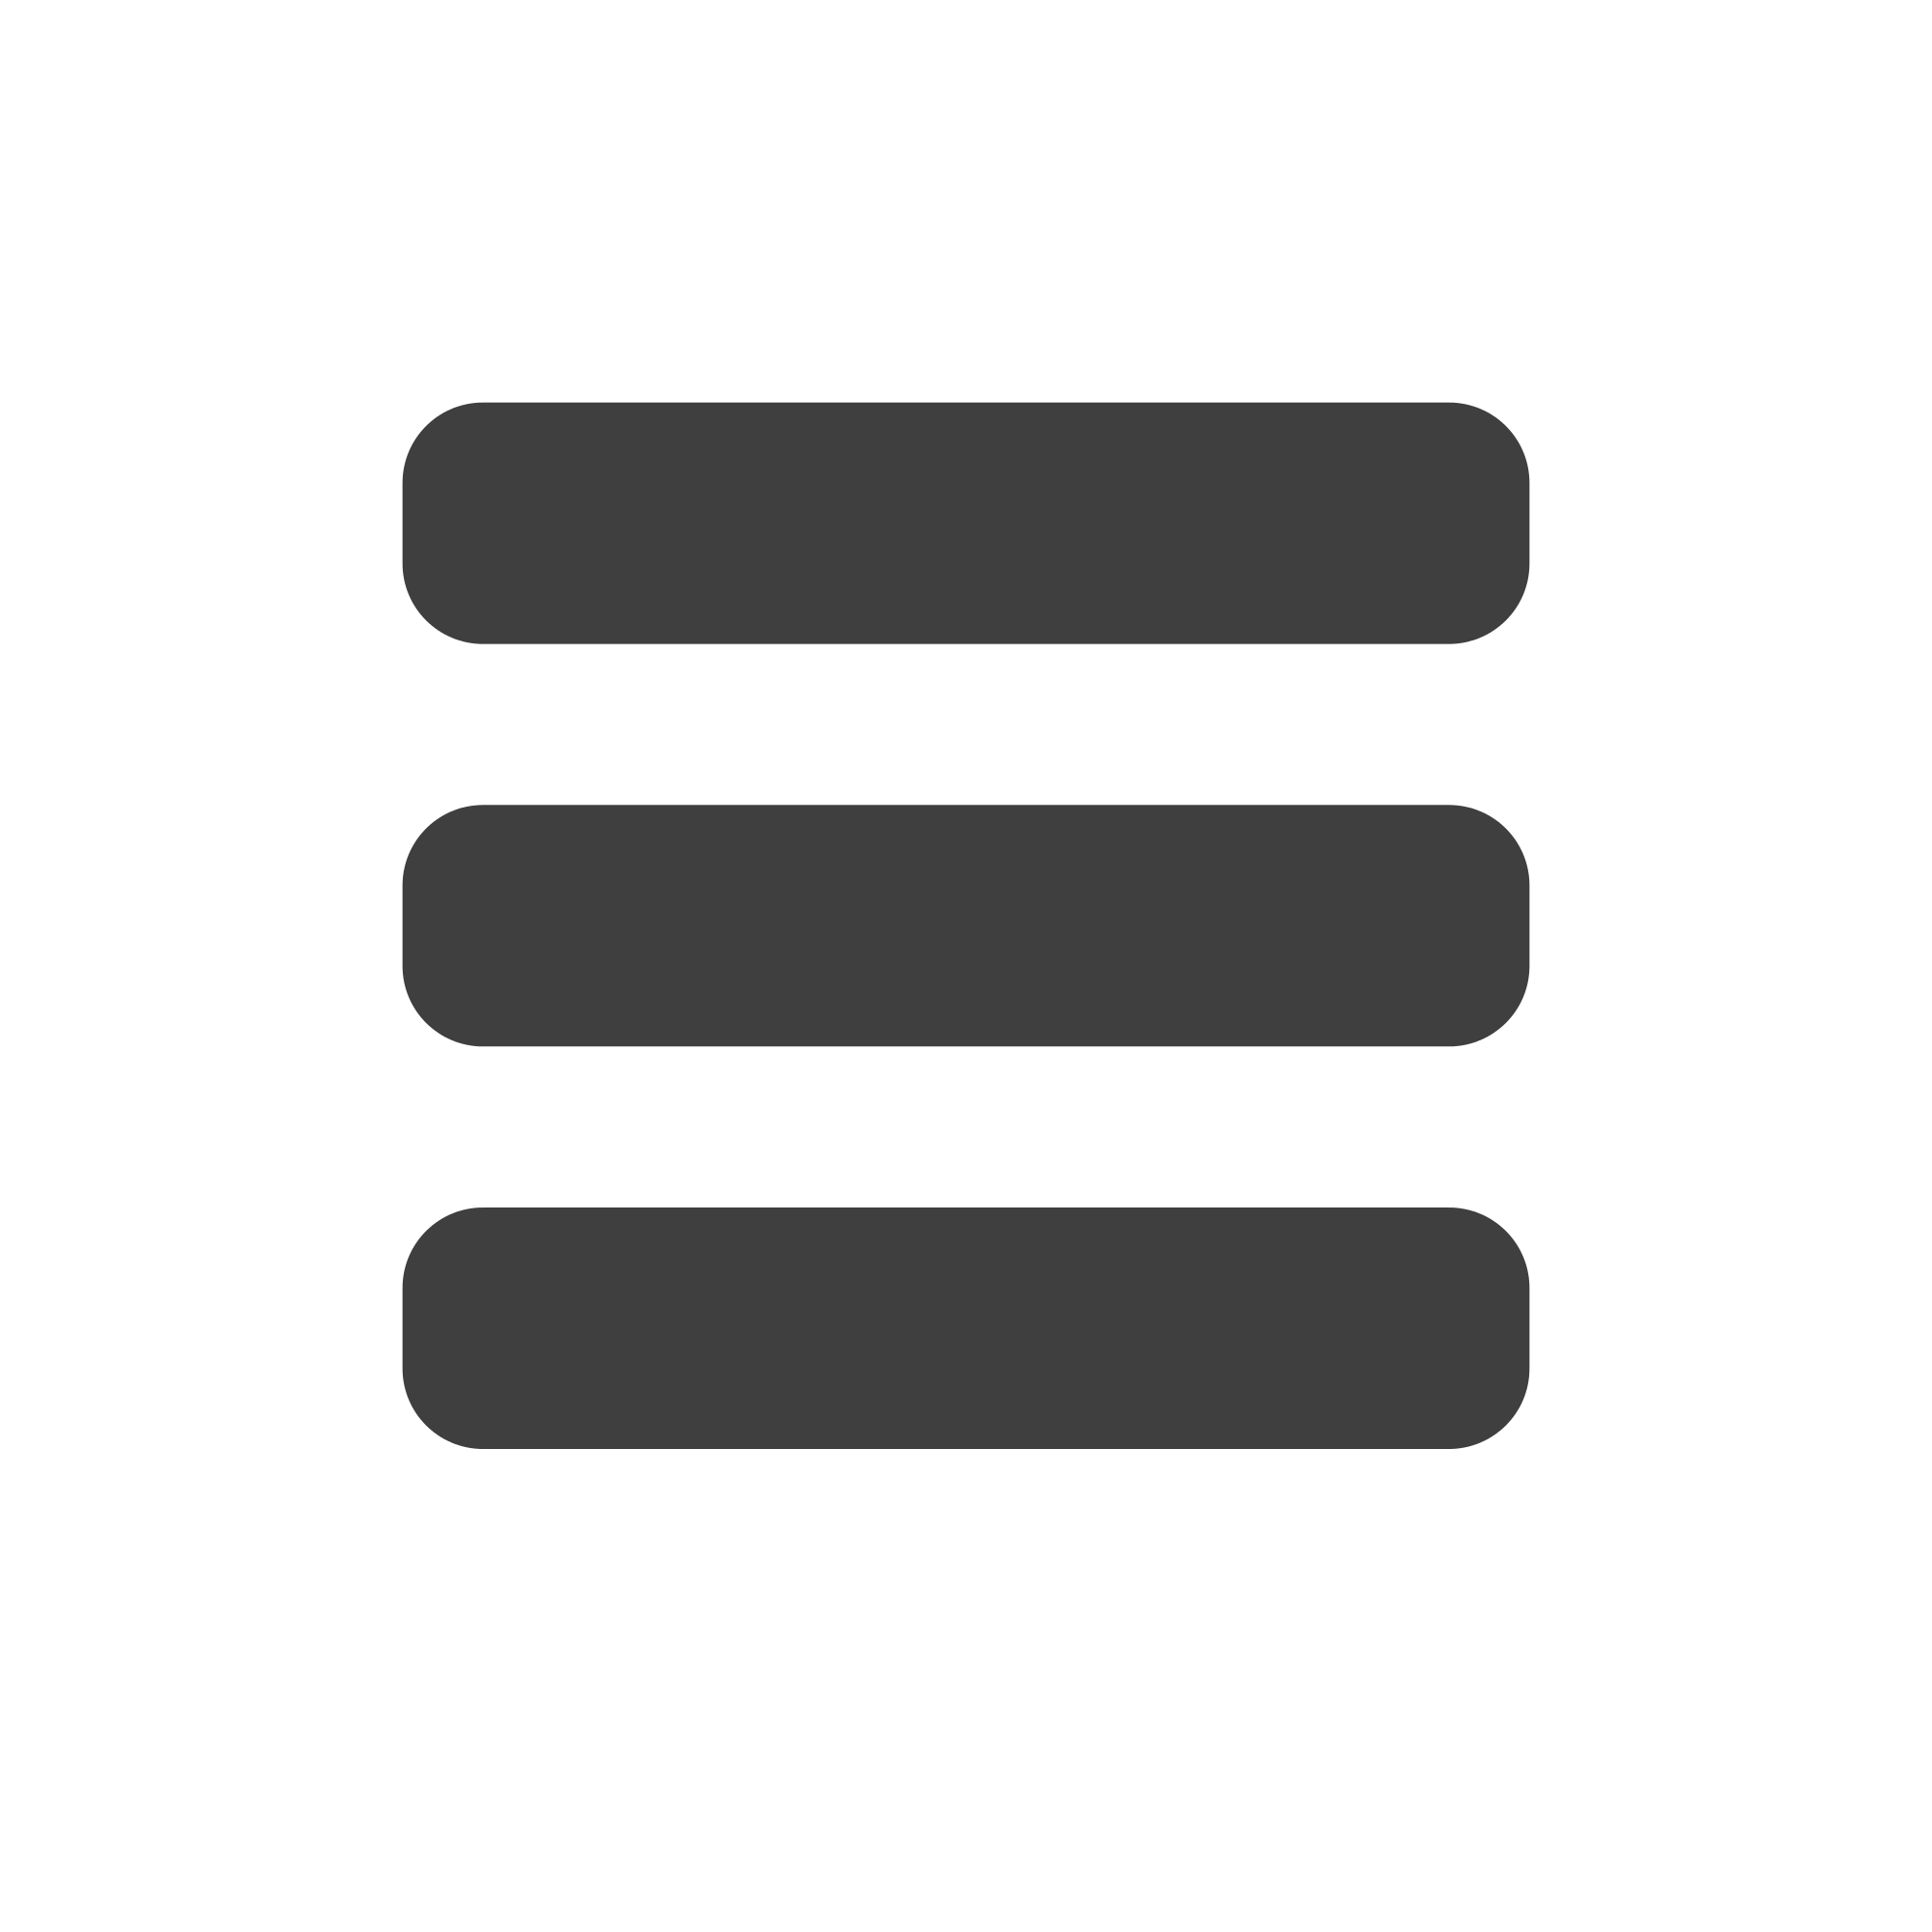 Hamburger menu icon clipart image royalty free stock Grey Menu Icon transparent PNG - StickPNG image royalty free stock